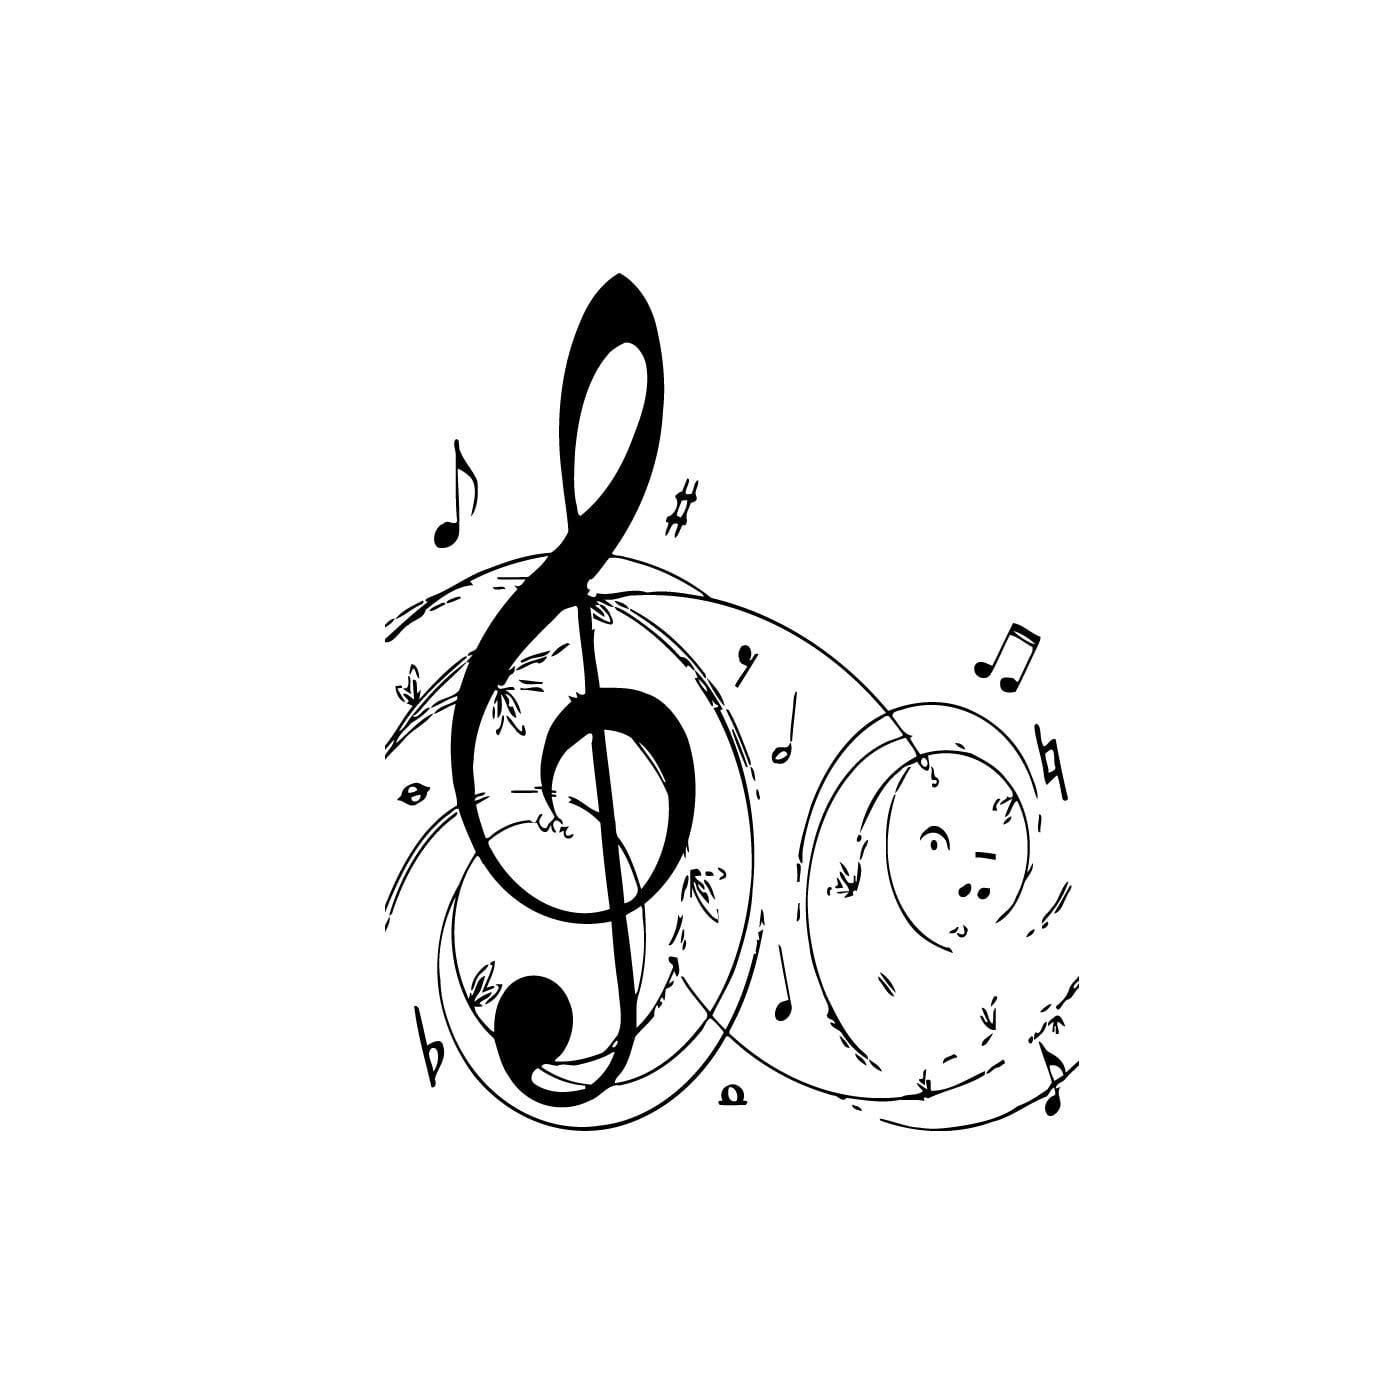 Zawezo Del Patio And Music Llc